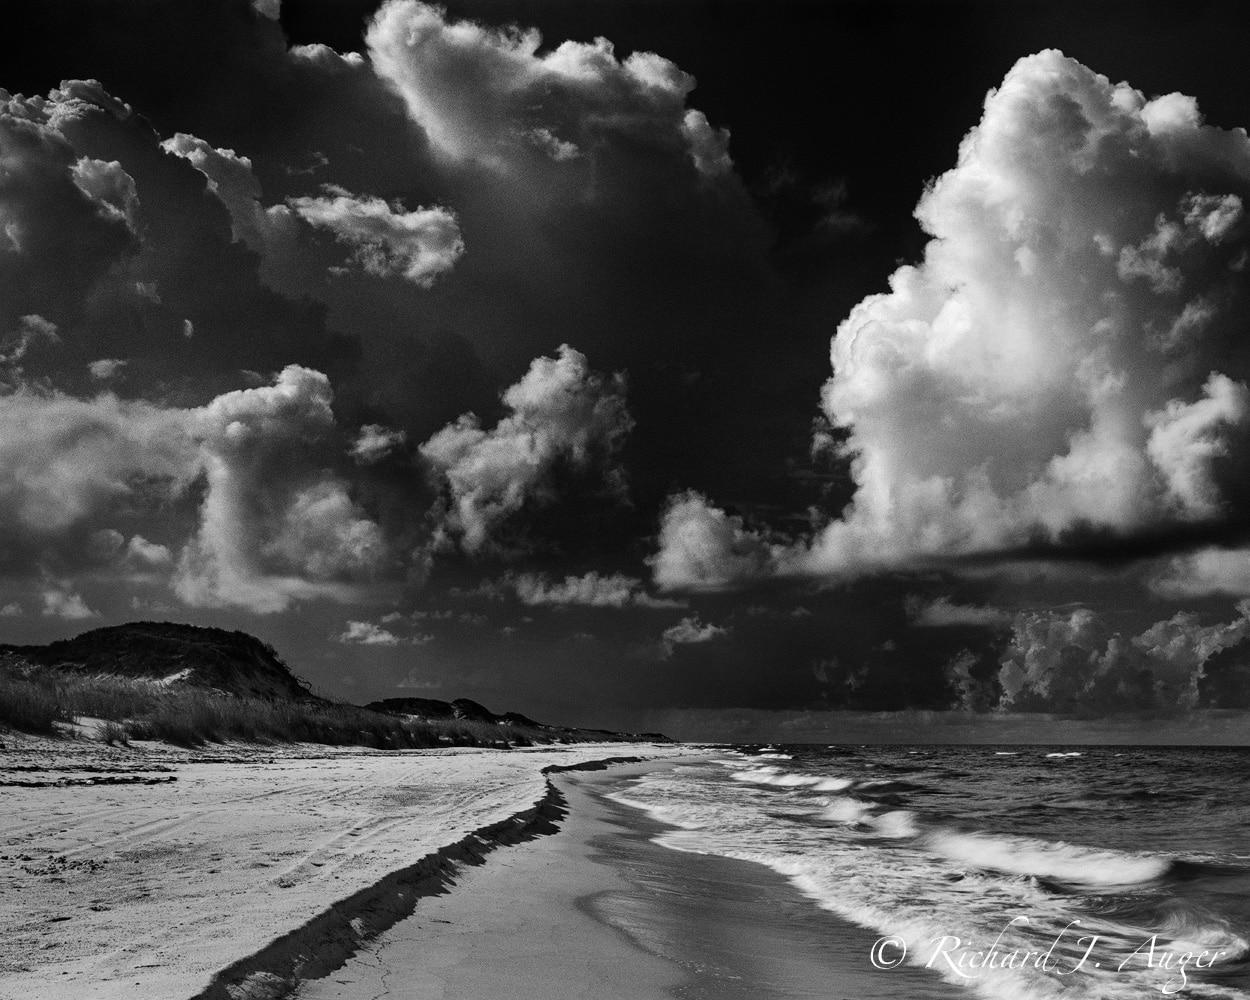 St Joe Peninsula State Park, Cape San Blas, Florida Panhandle, Beach, Remote, Black and White, Dunes, Storm, Waves, Clouds